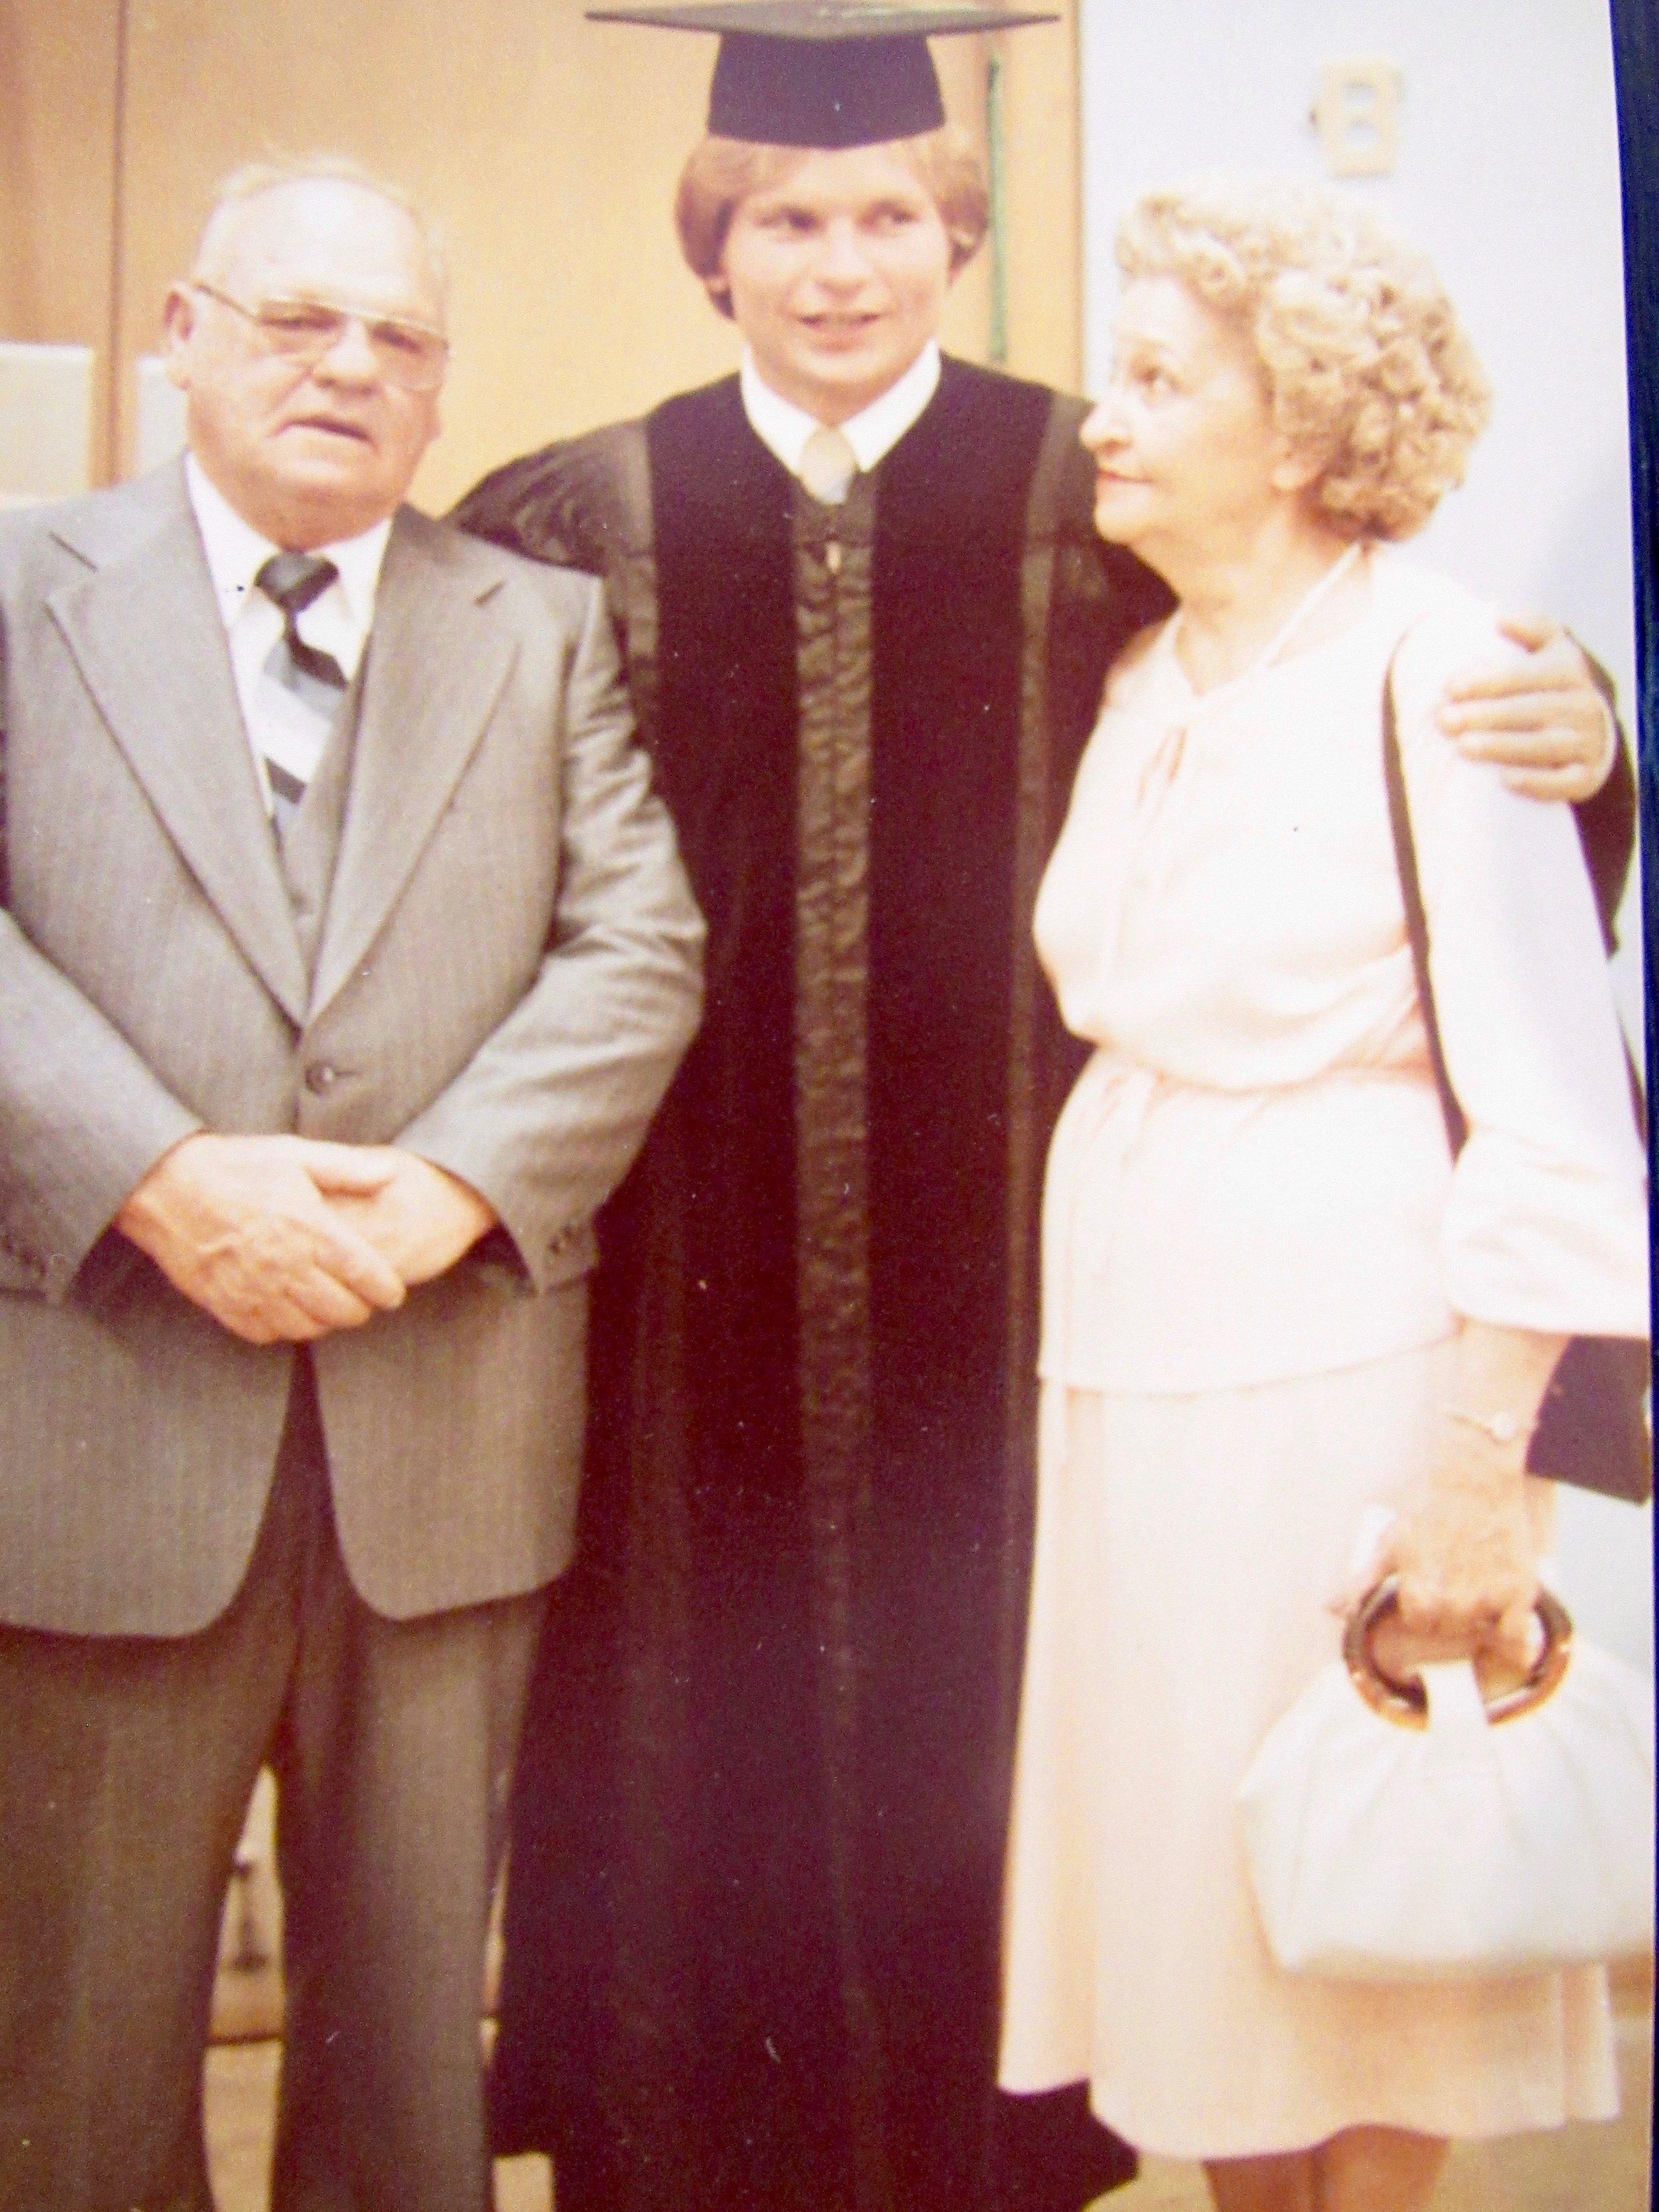 Jim's graduating ceremony